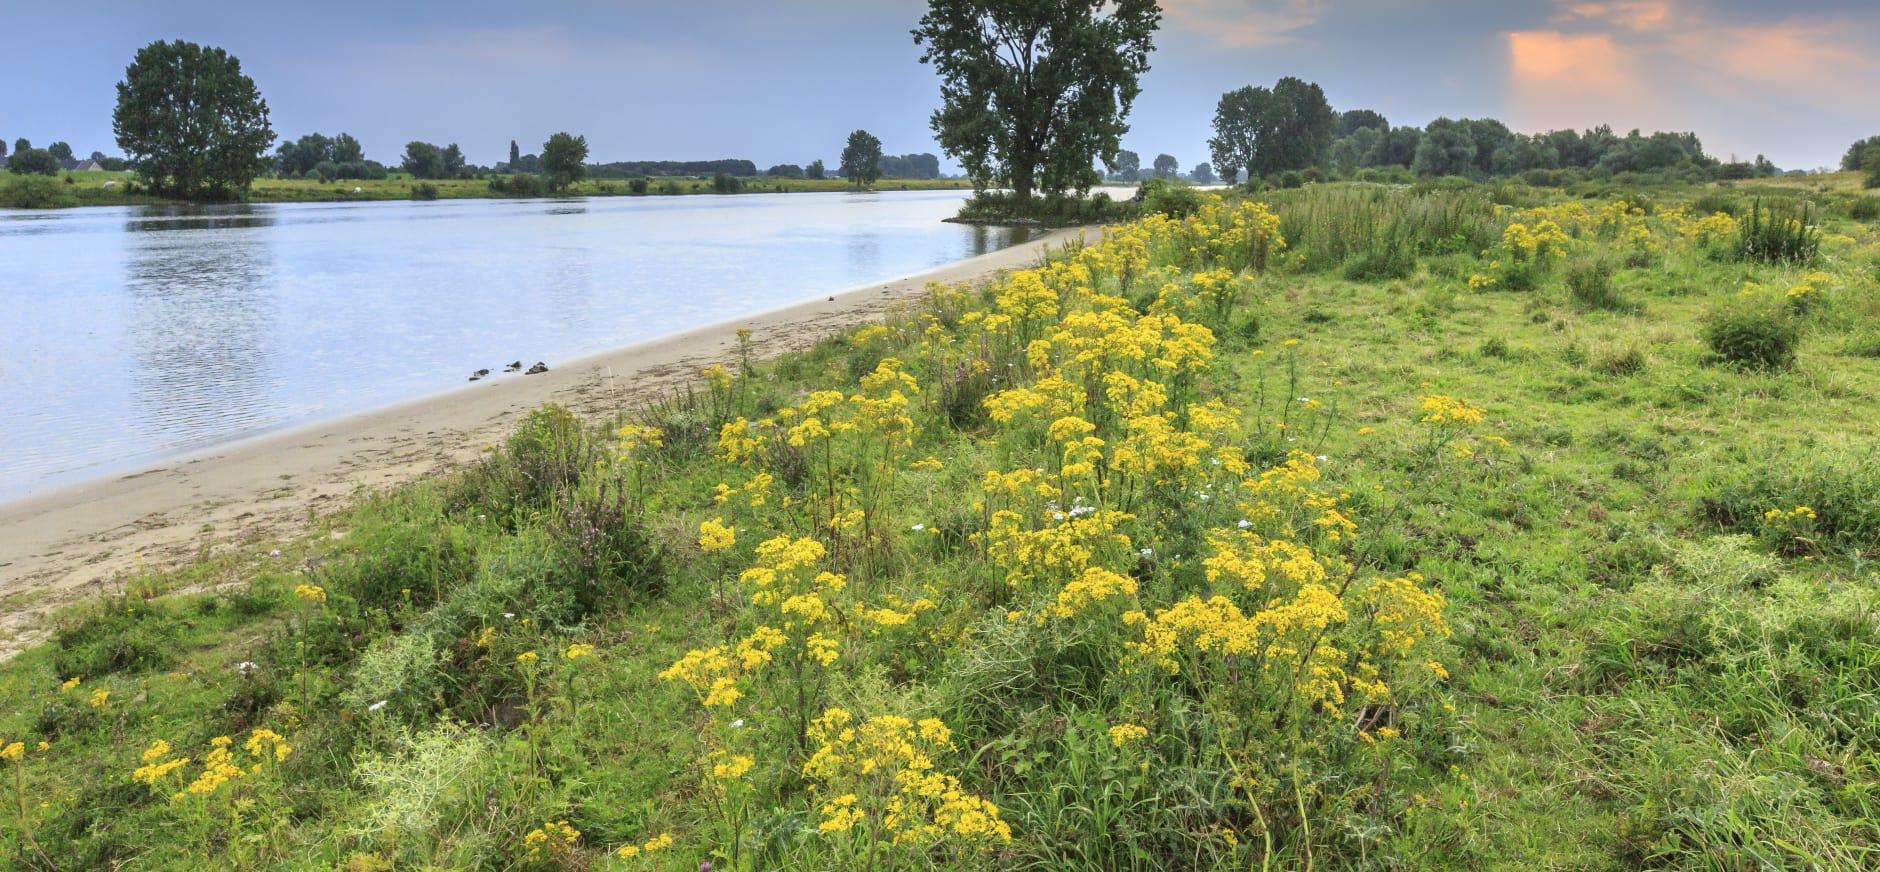 Maasuiterwaarden, riviernatuur verspreid over 70 km langs de Maas.